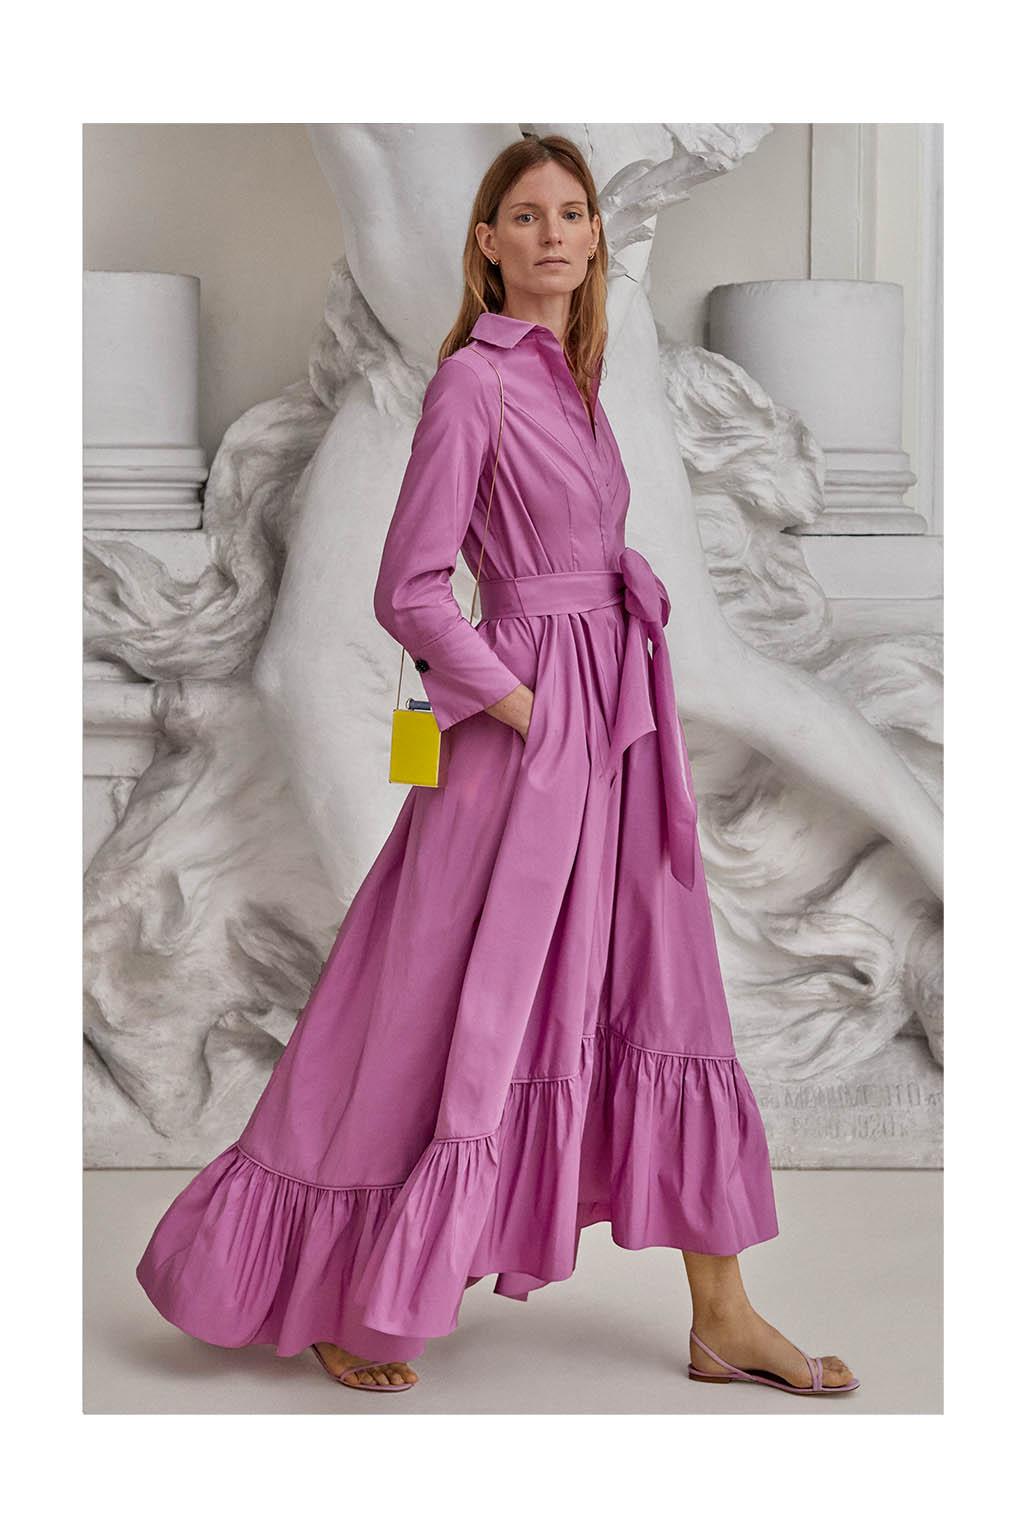 CH Carolina Herrera. New Womenswear Collection Evening. Look 06